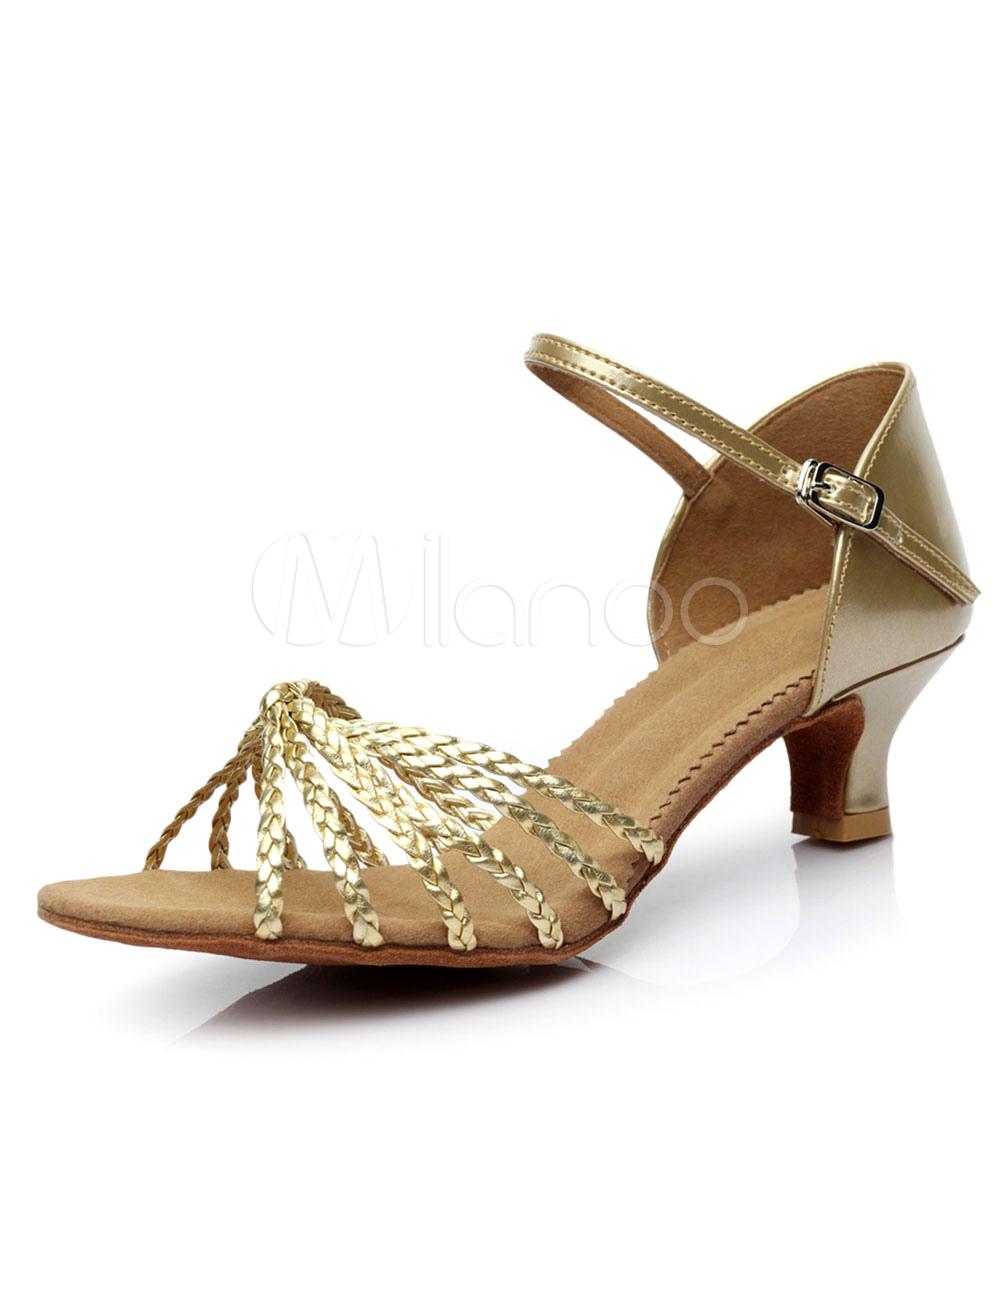 lateinamerikanische t nze gold sandalen riemchen pu heels. Black Bedroom Furniture Sets. Home Design Ideas